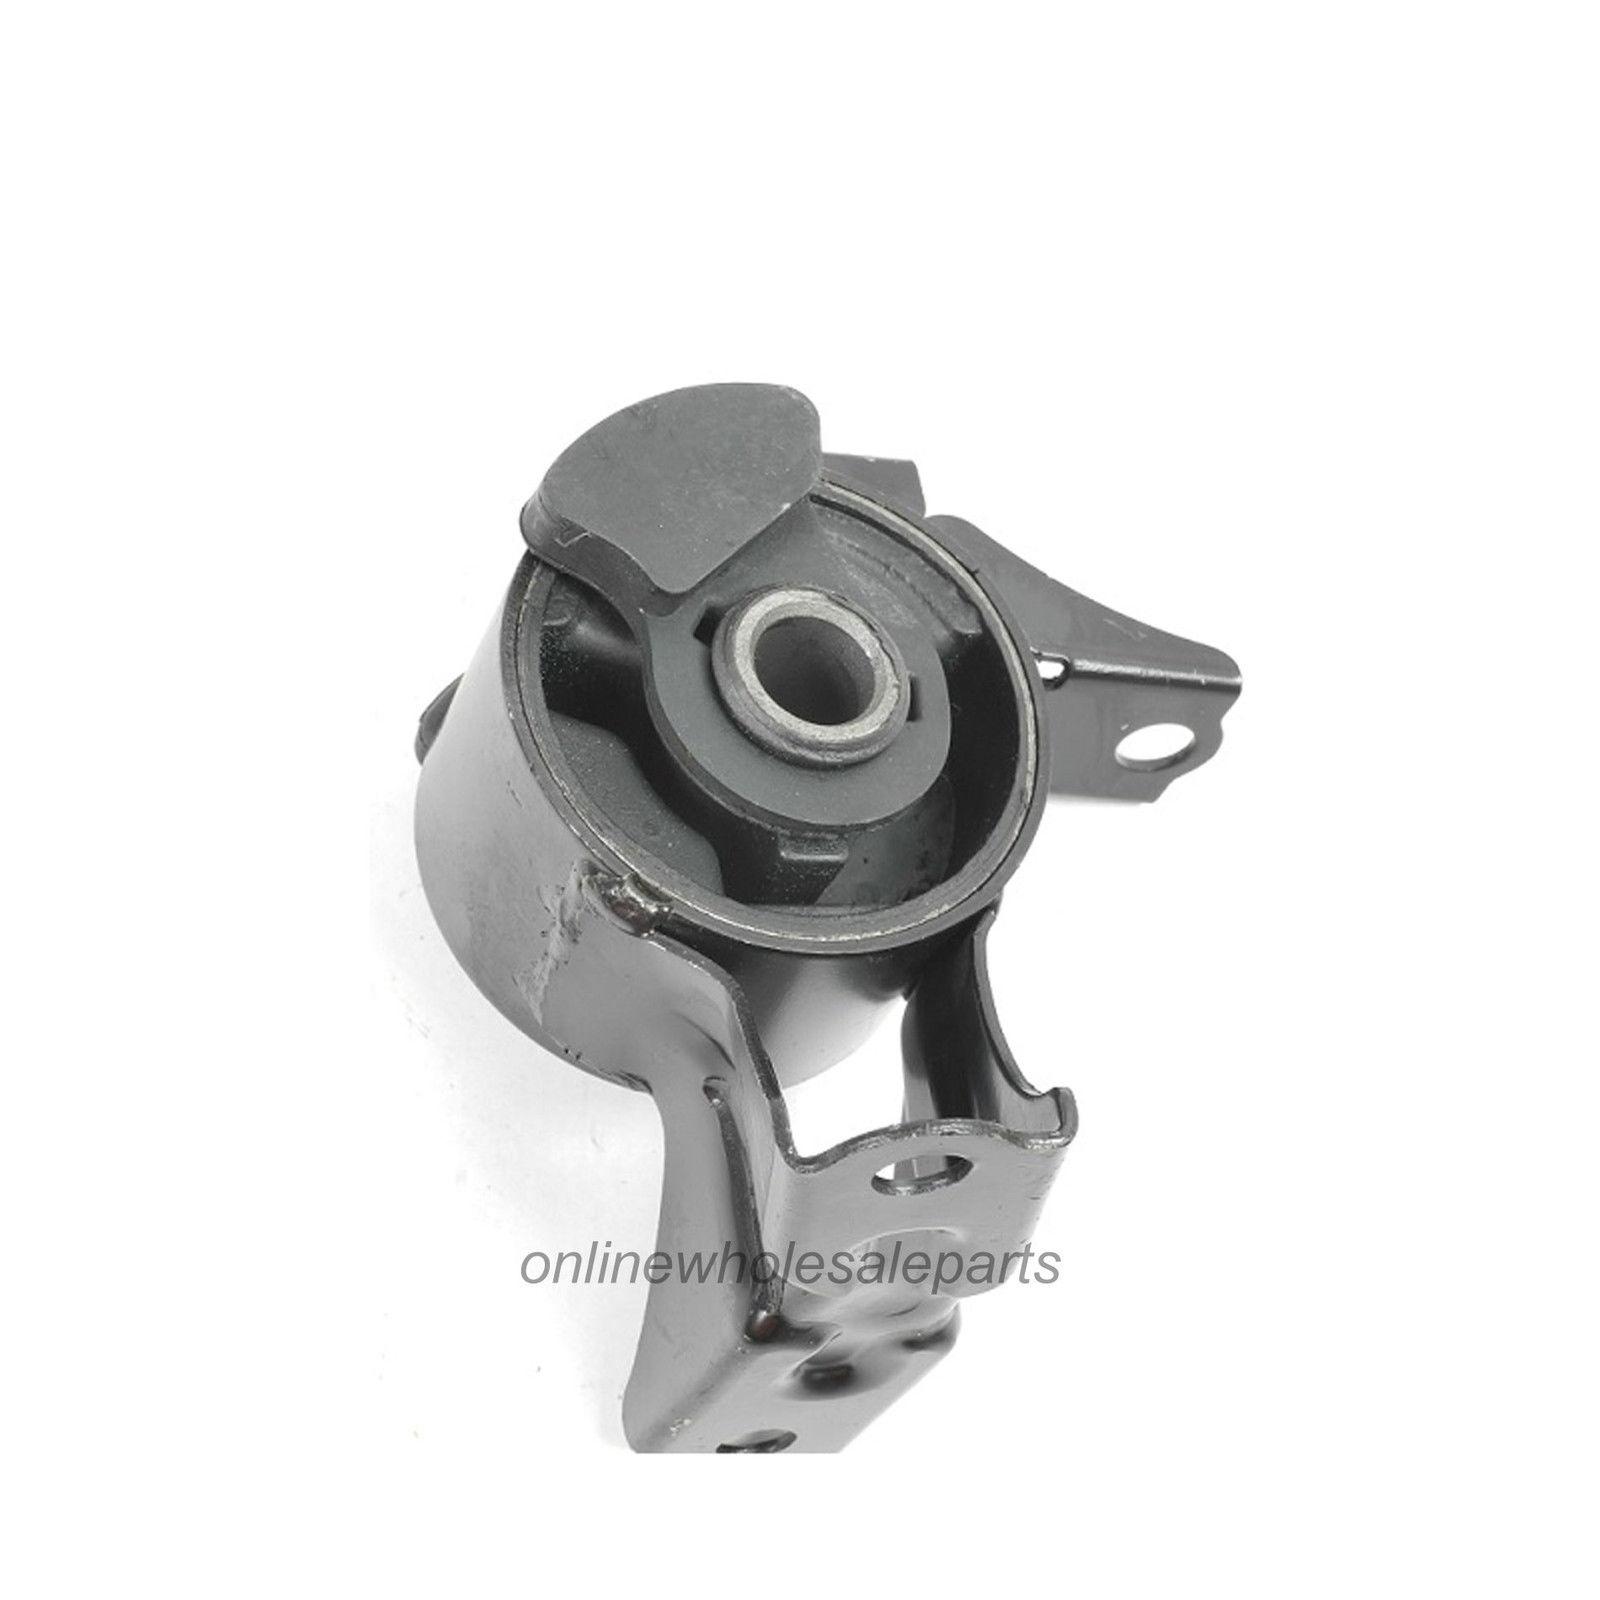 Engine Motor Mount Front Right For Honda Odyssey Pilot 3.5L 4587